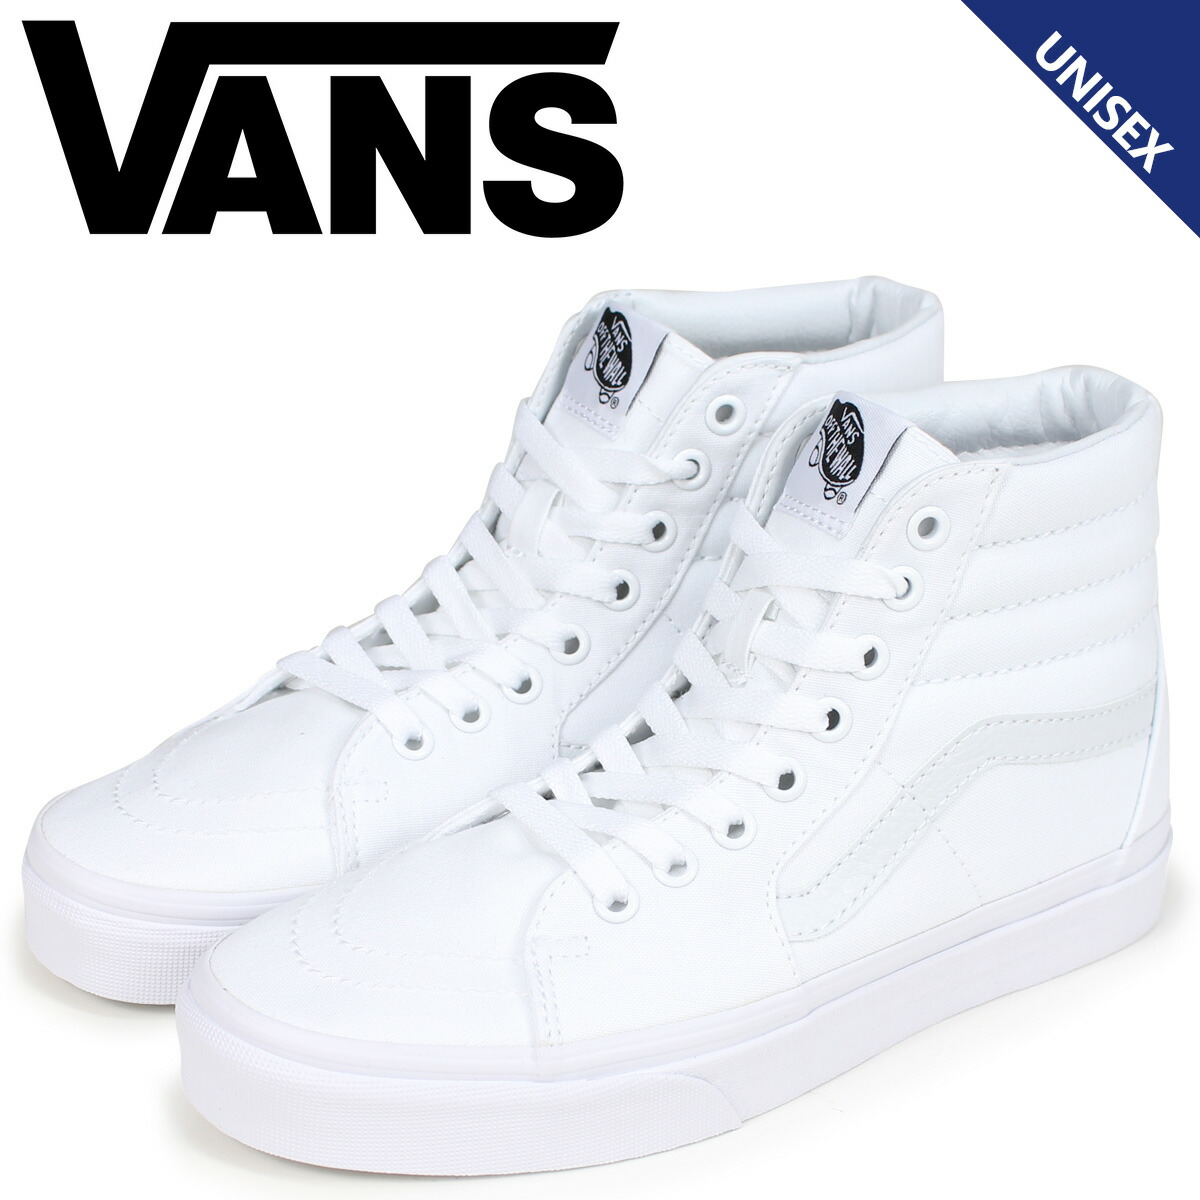 6b06427db7ba64 Sugar Online Shop  Vans SK8-HI sneakers Lady s men VANS station ...